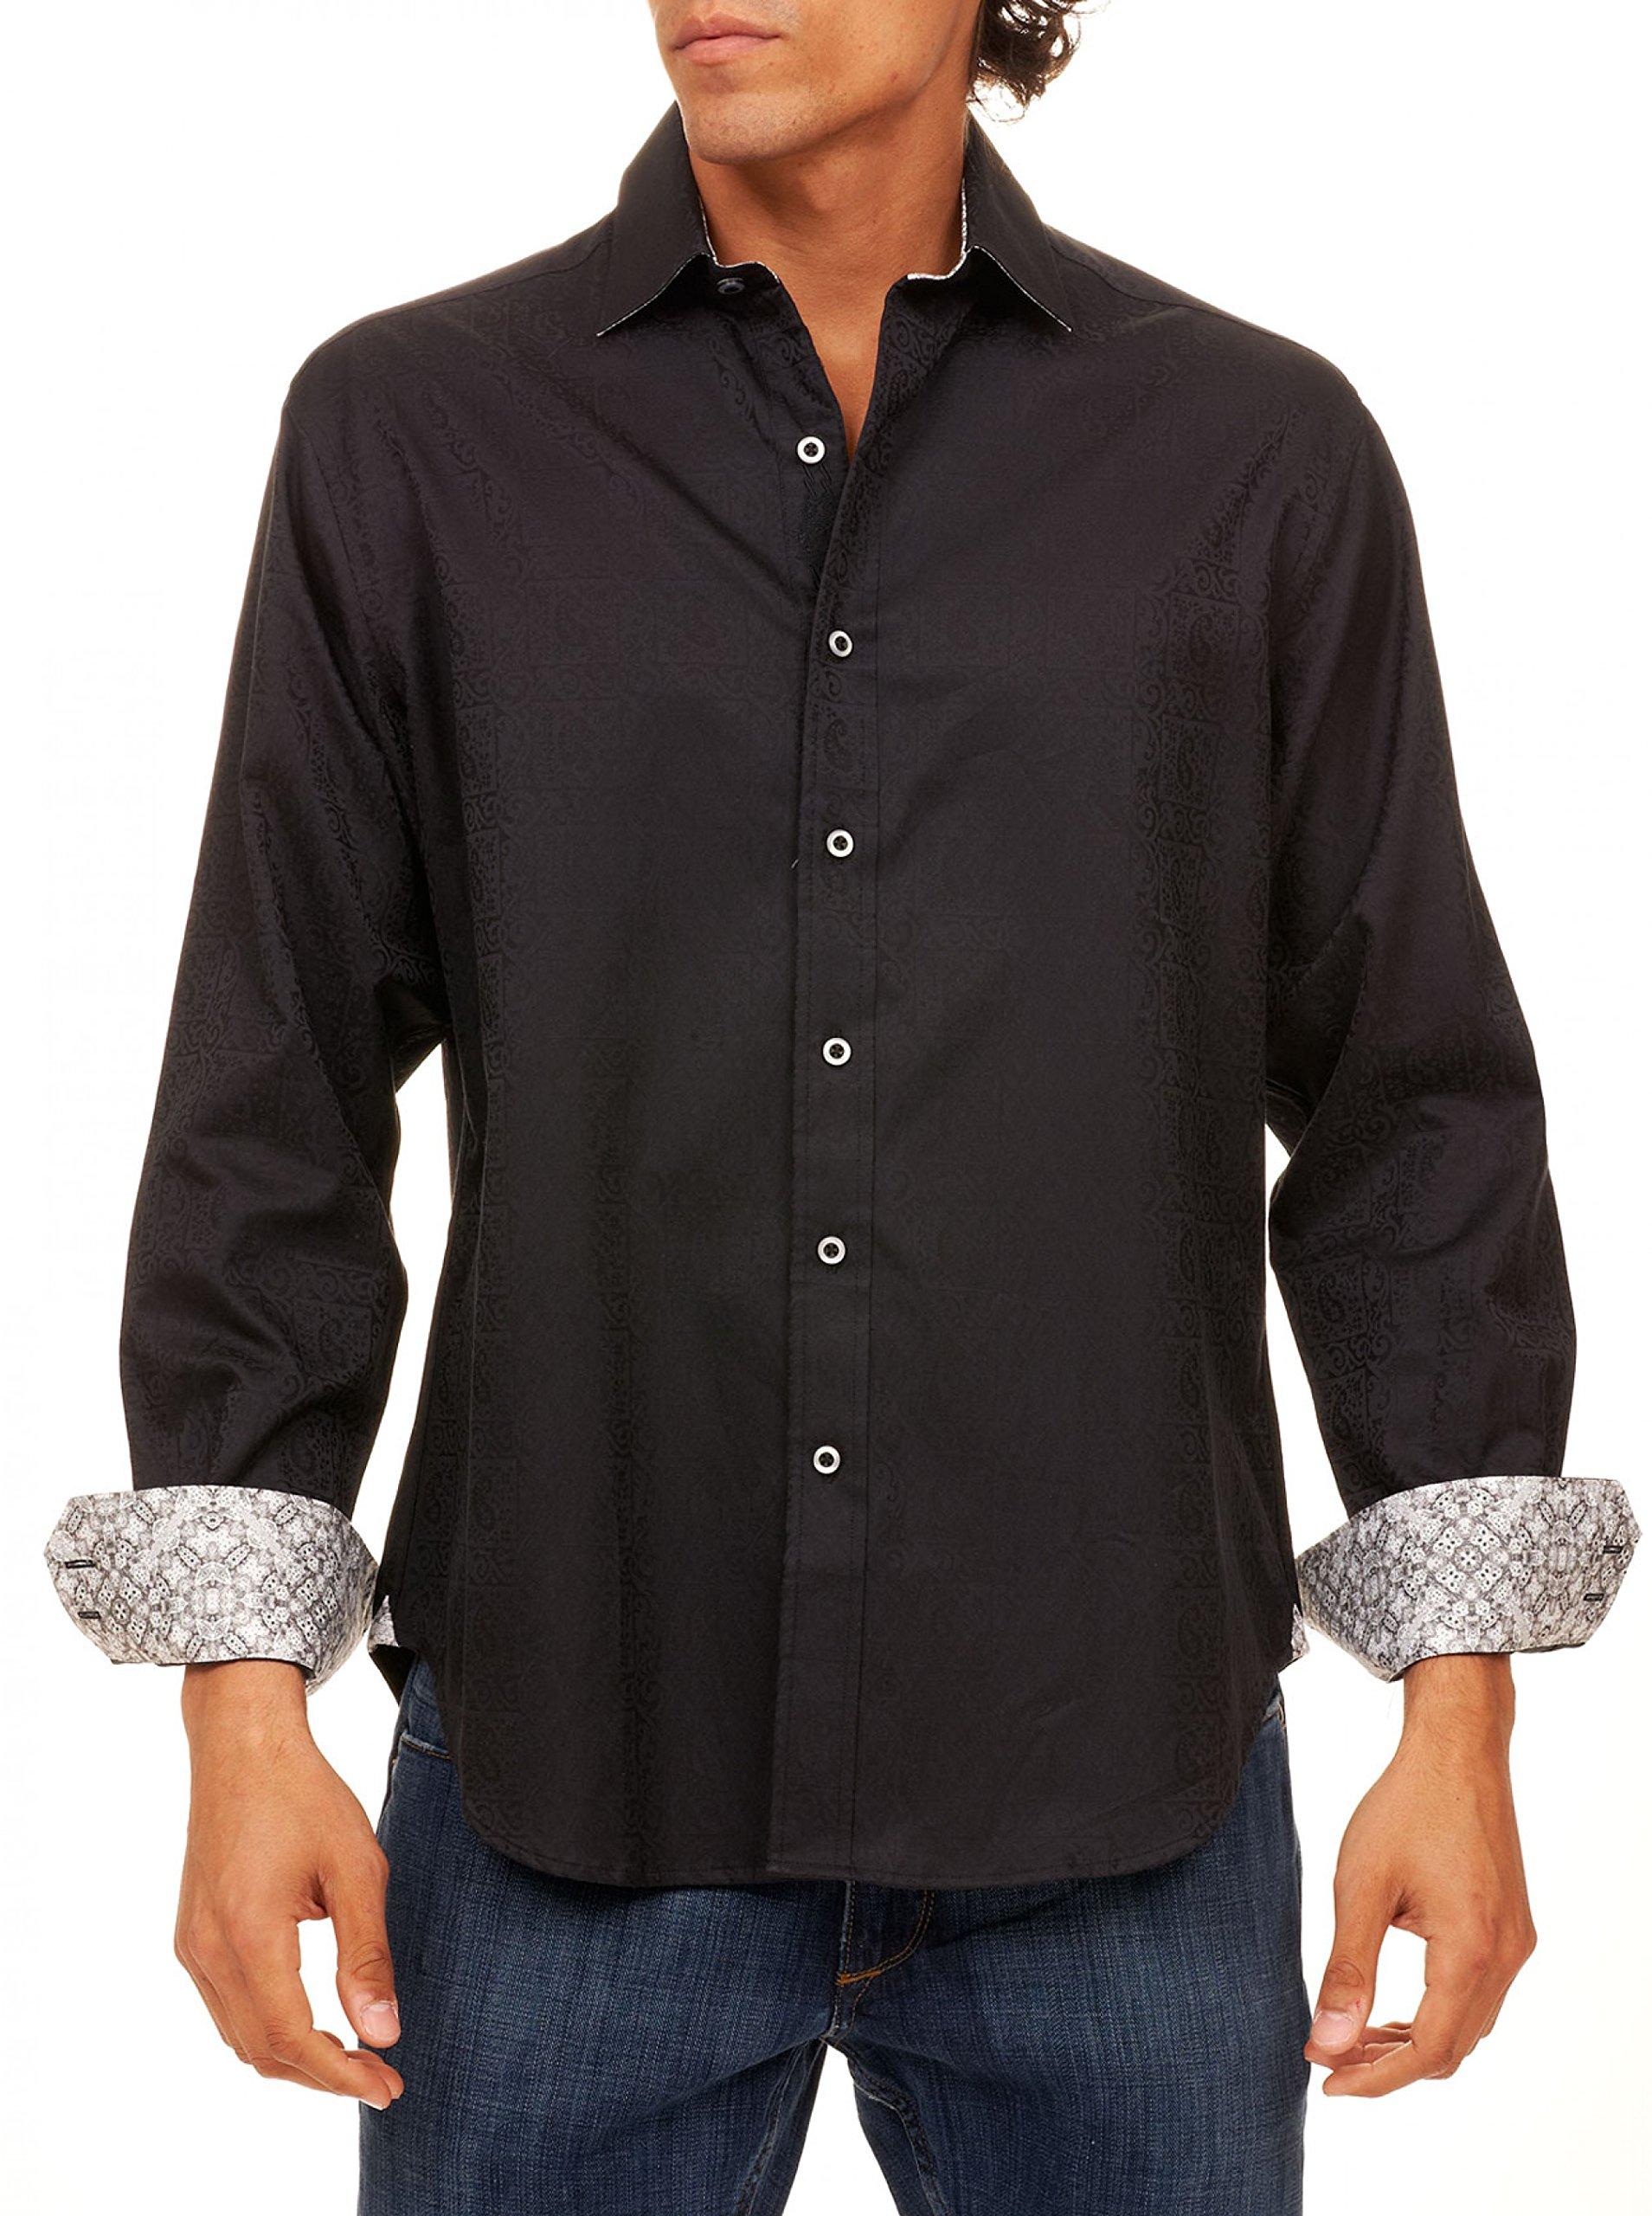 Robert Graham Men's Windsor Classic Fit Long Sleeve Shirt, Black, 3XLARGE